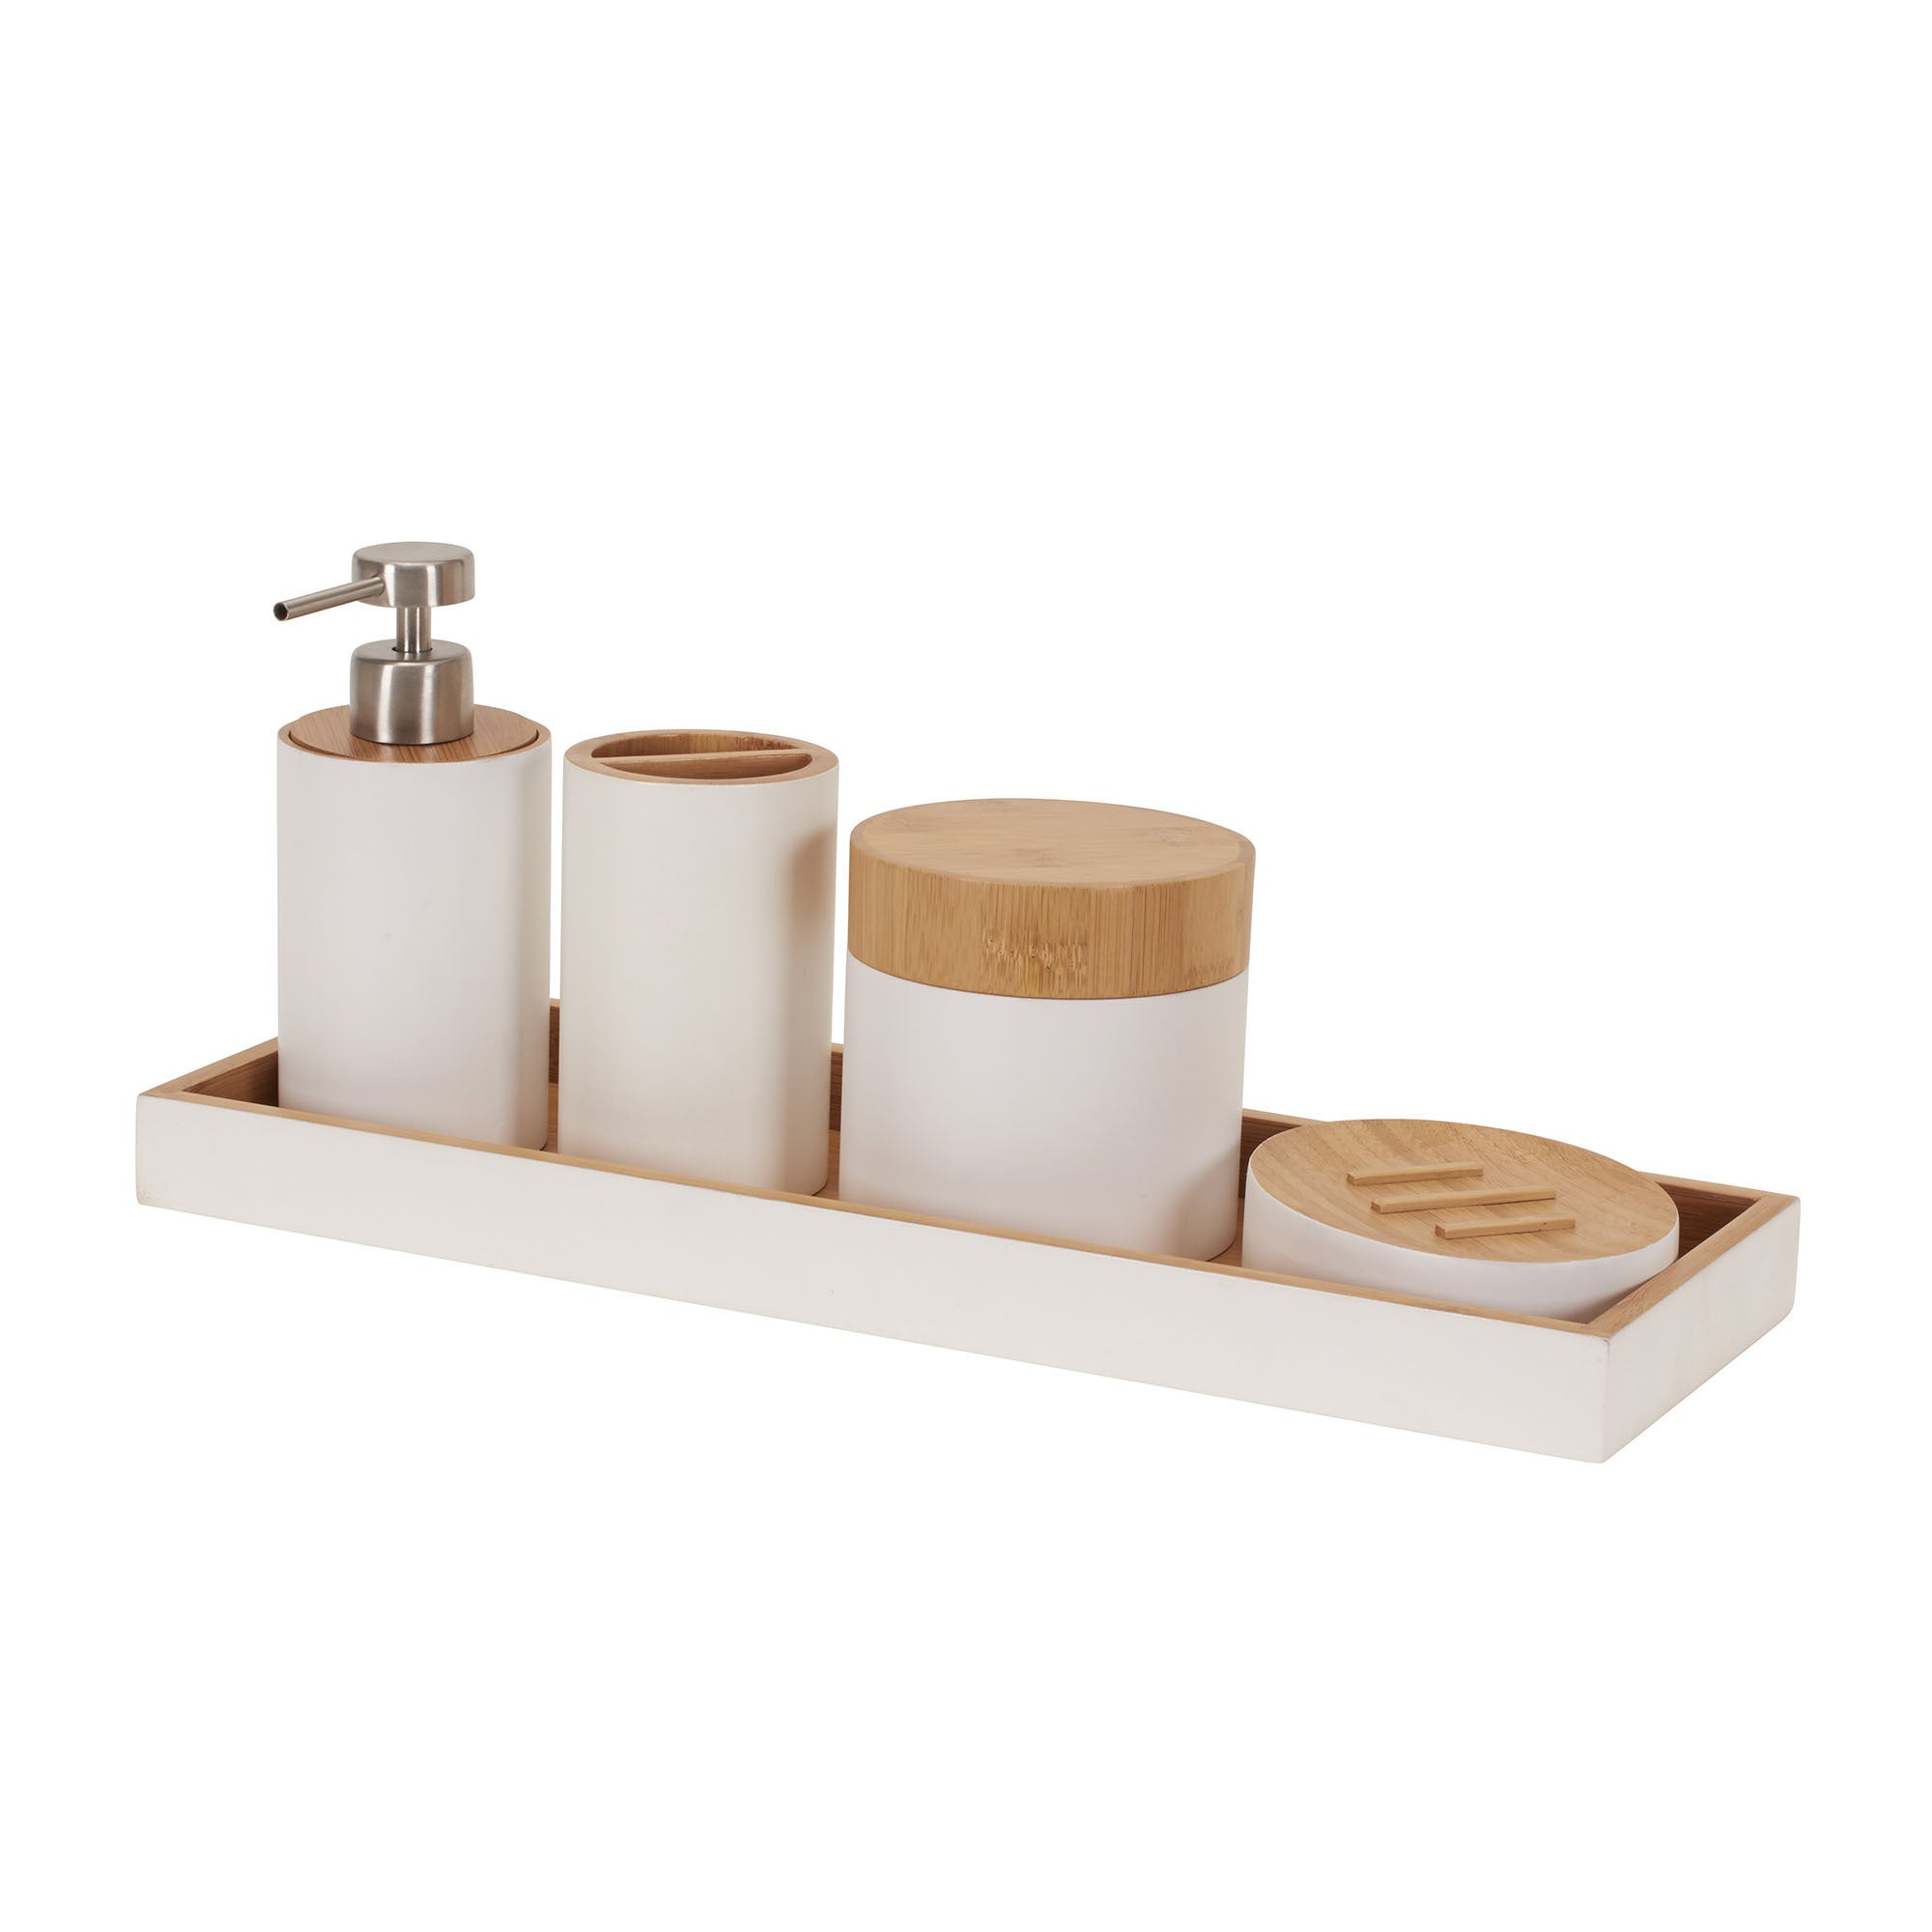 Wood Bathroom Set Complete with Soap Dispenser Bamboo Bathroom Accessories Set Bamboo Wood Bathroom Modern Vanity Set Soap Holder Mug Toothbrush Holder